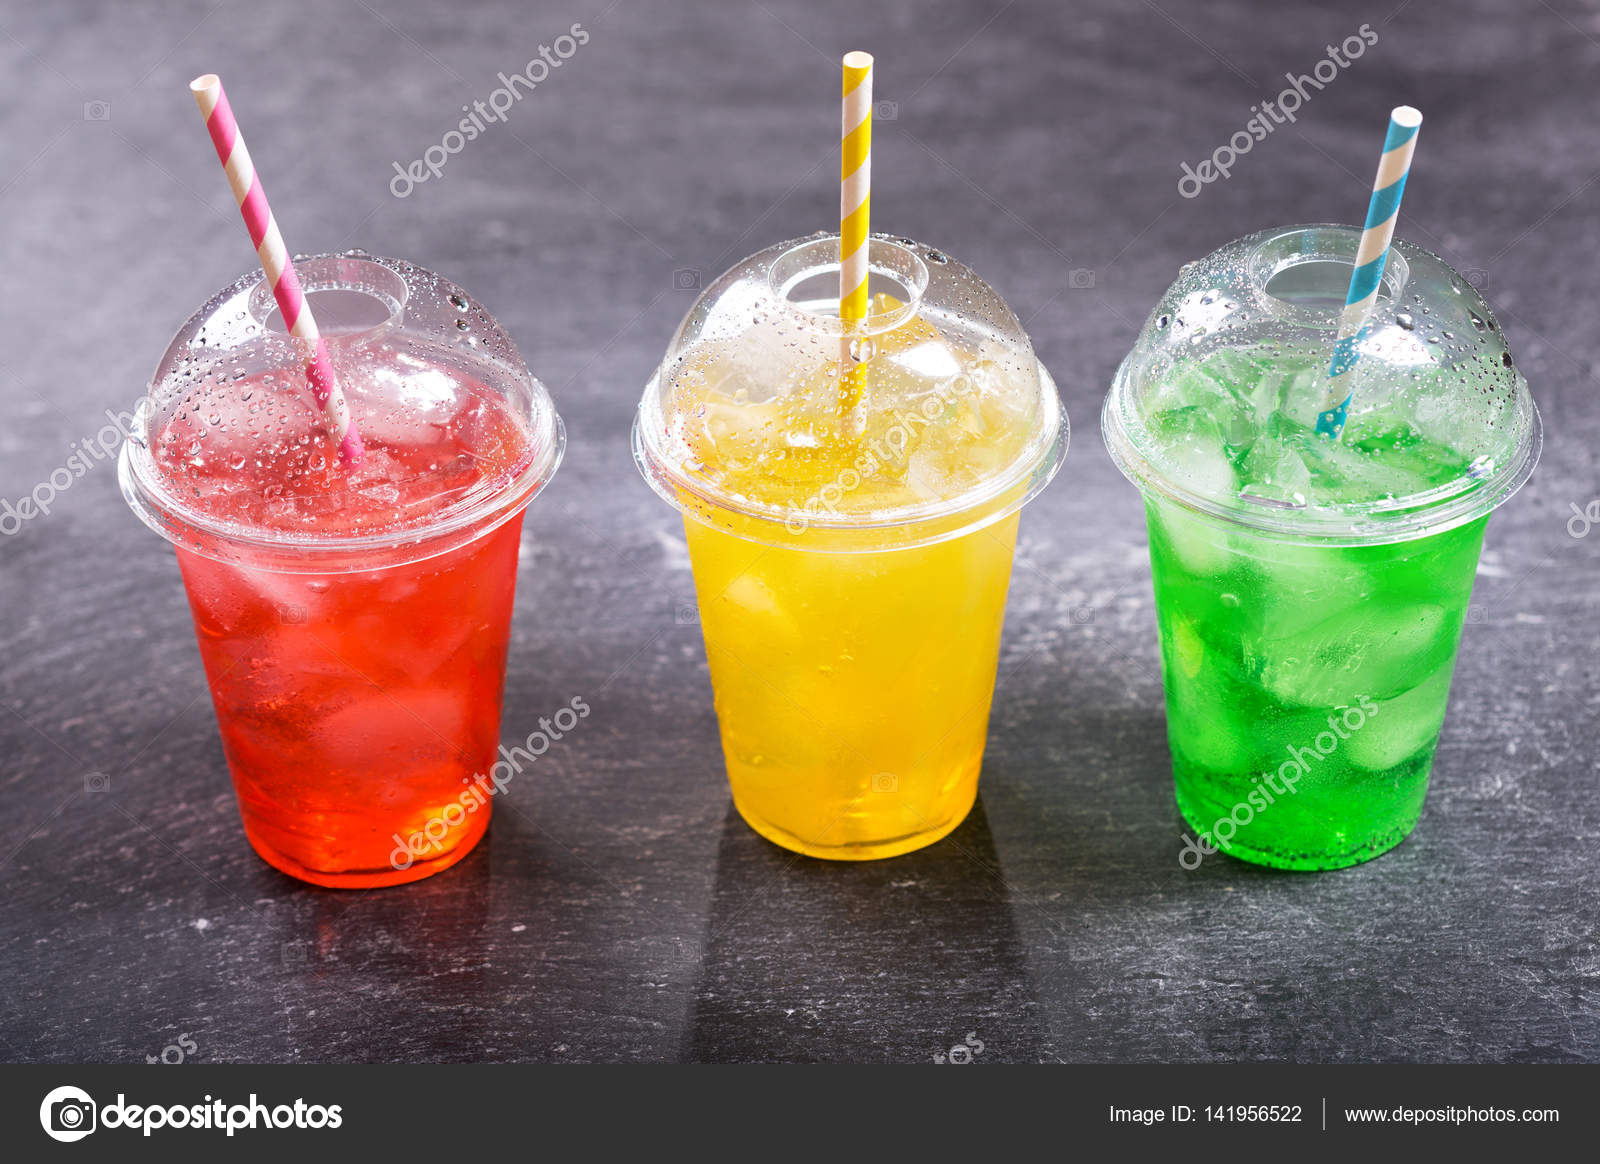 bunte kalte Getränke in Plastikbechern — Stockfoto © Nitrub #141956522